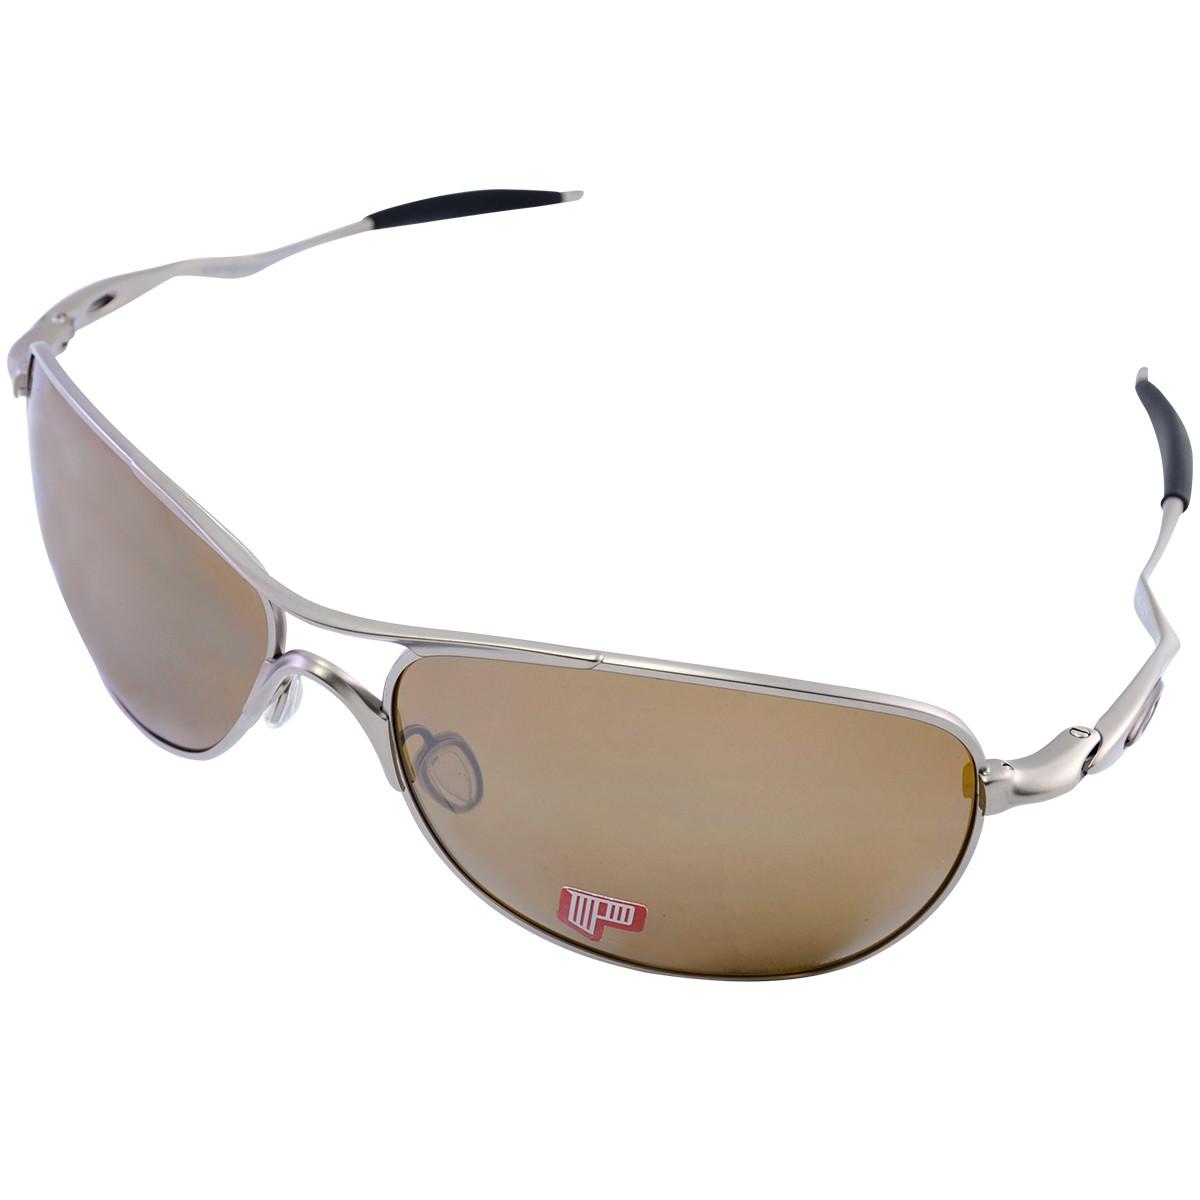 Óculos Oakley Crosshair Brown Titanium Lente Tungstein Iridium Polarizado 6280b4b4b1